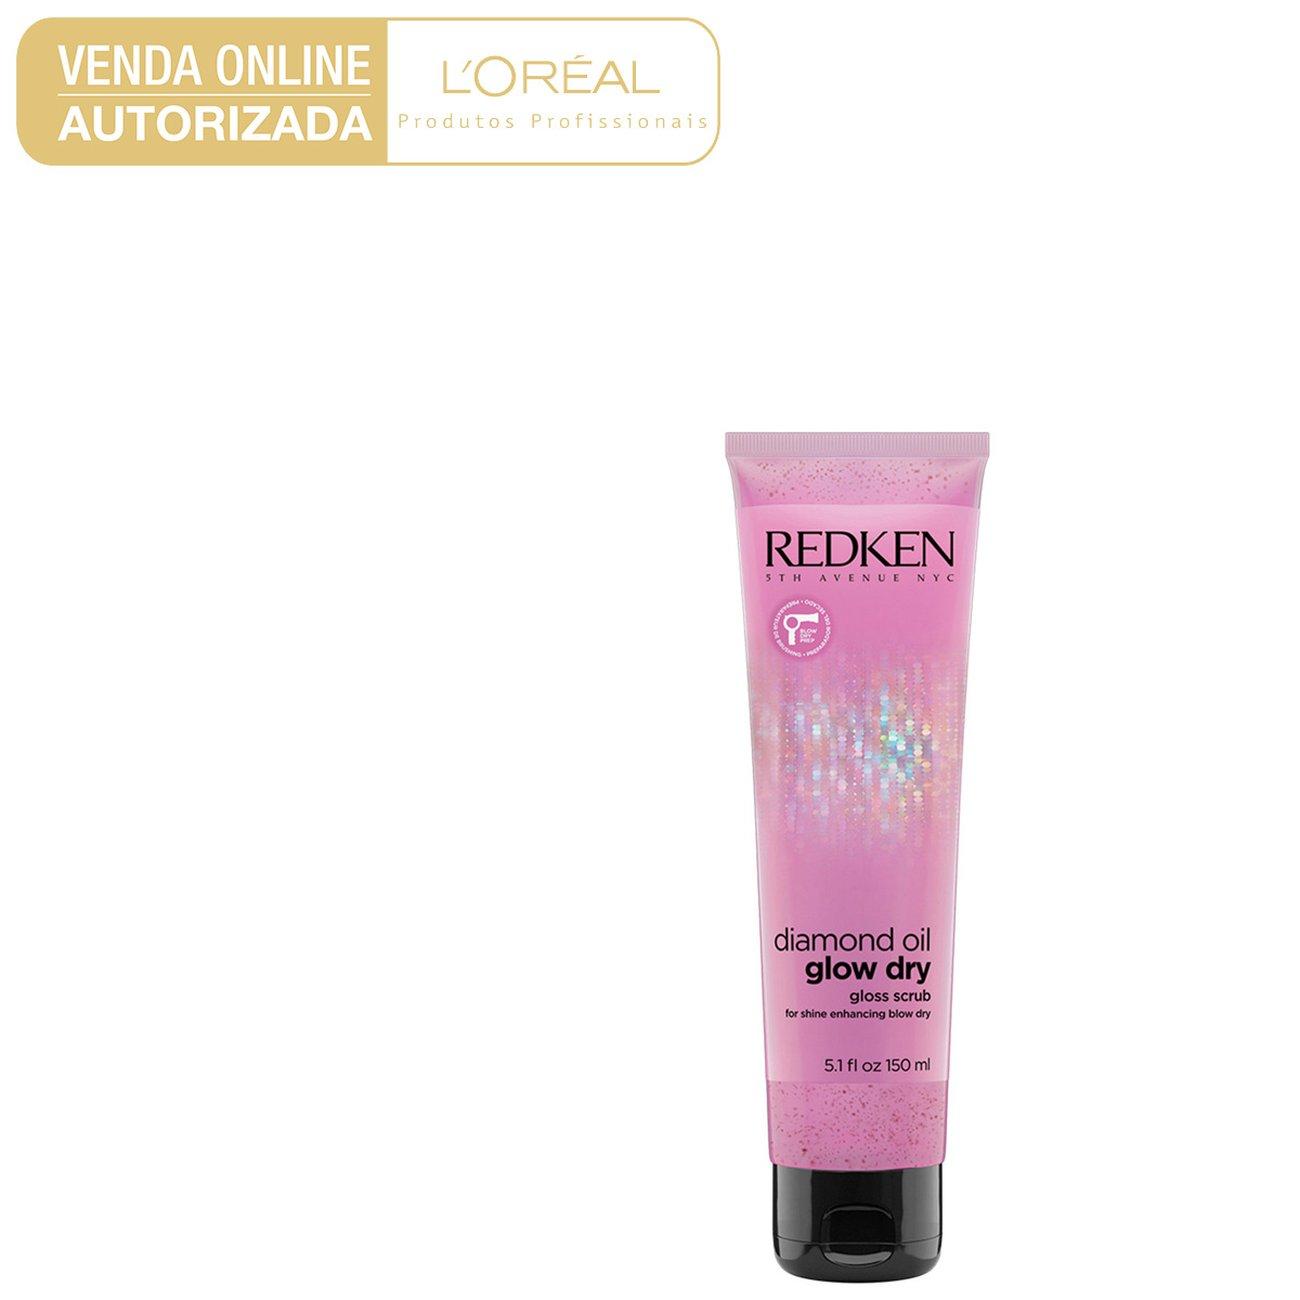 Pré-Shampoo Redken Diamond Oil Glow Dry Gloss Scrub 150ml - Incolor